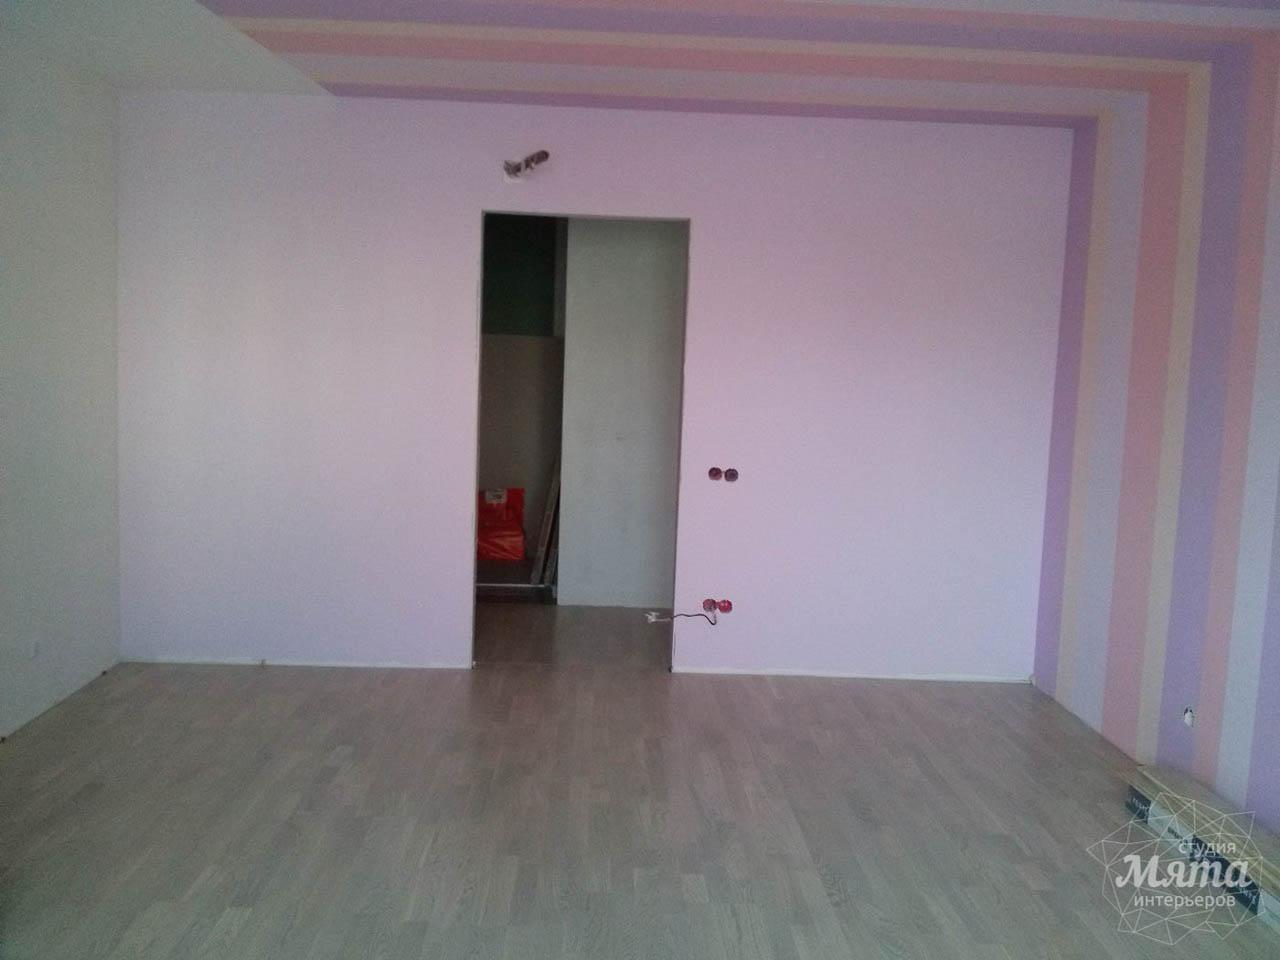 Дизайн интерьера и ремонт трехкомнатной квартиры по ул. Фучика 9 70